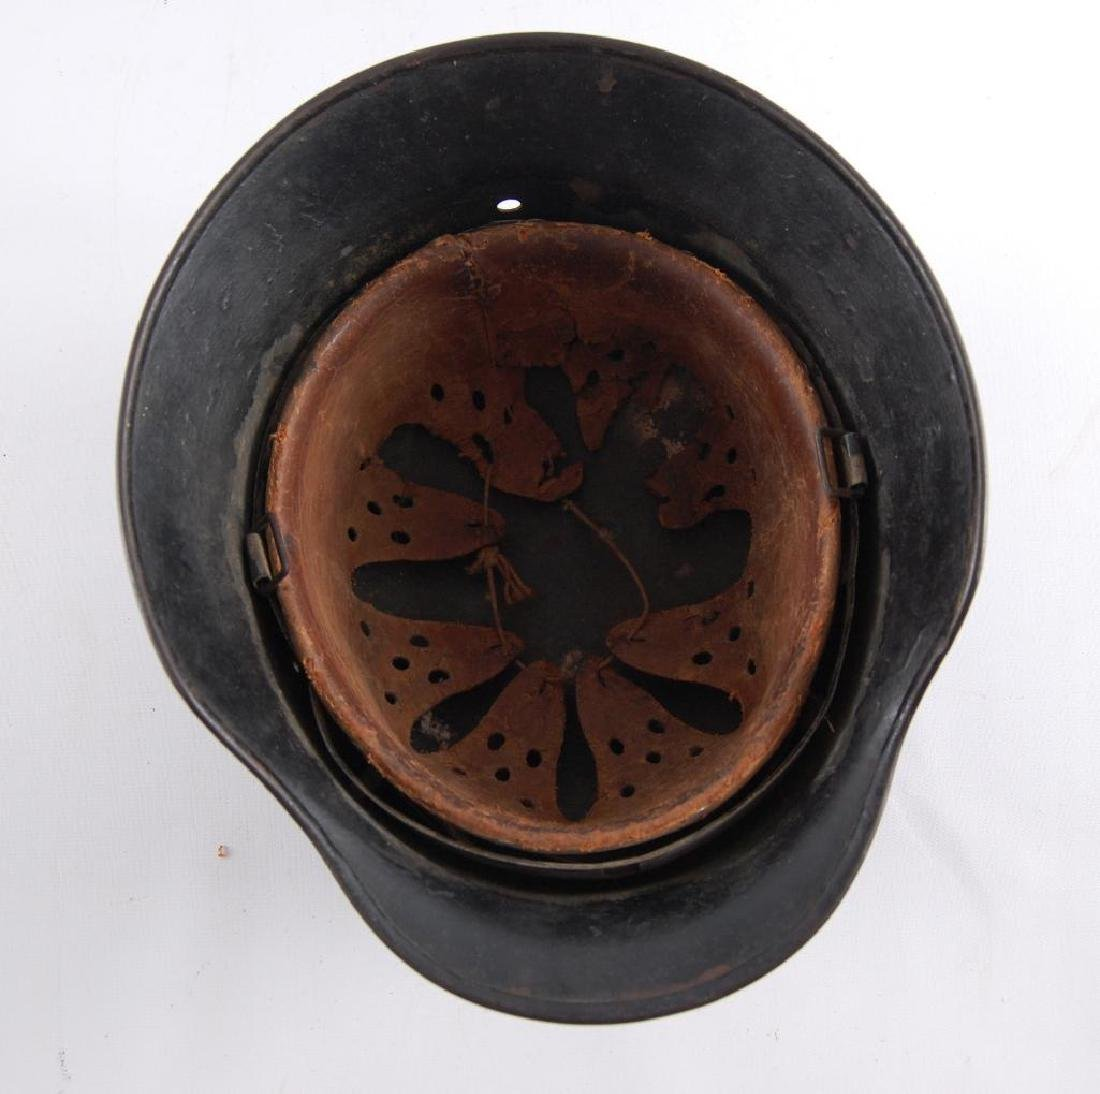 WW2 German Army Helmet - 6